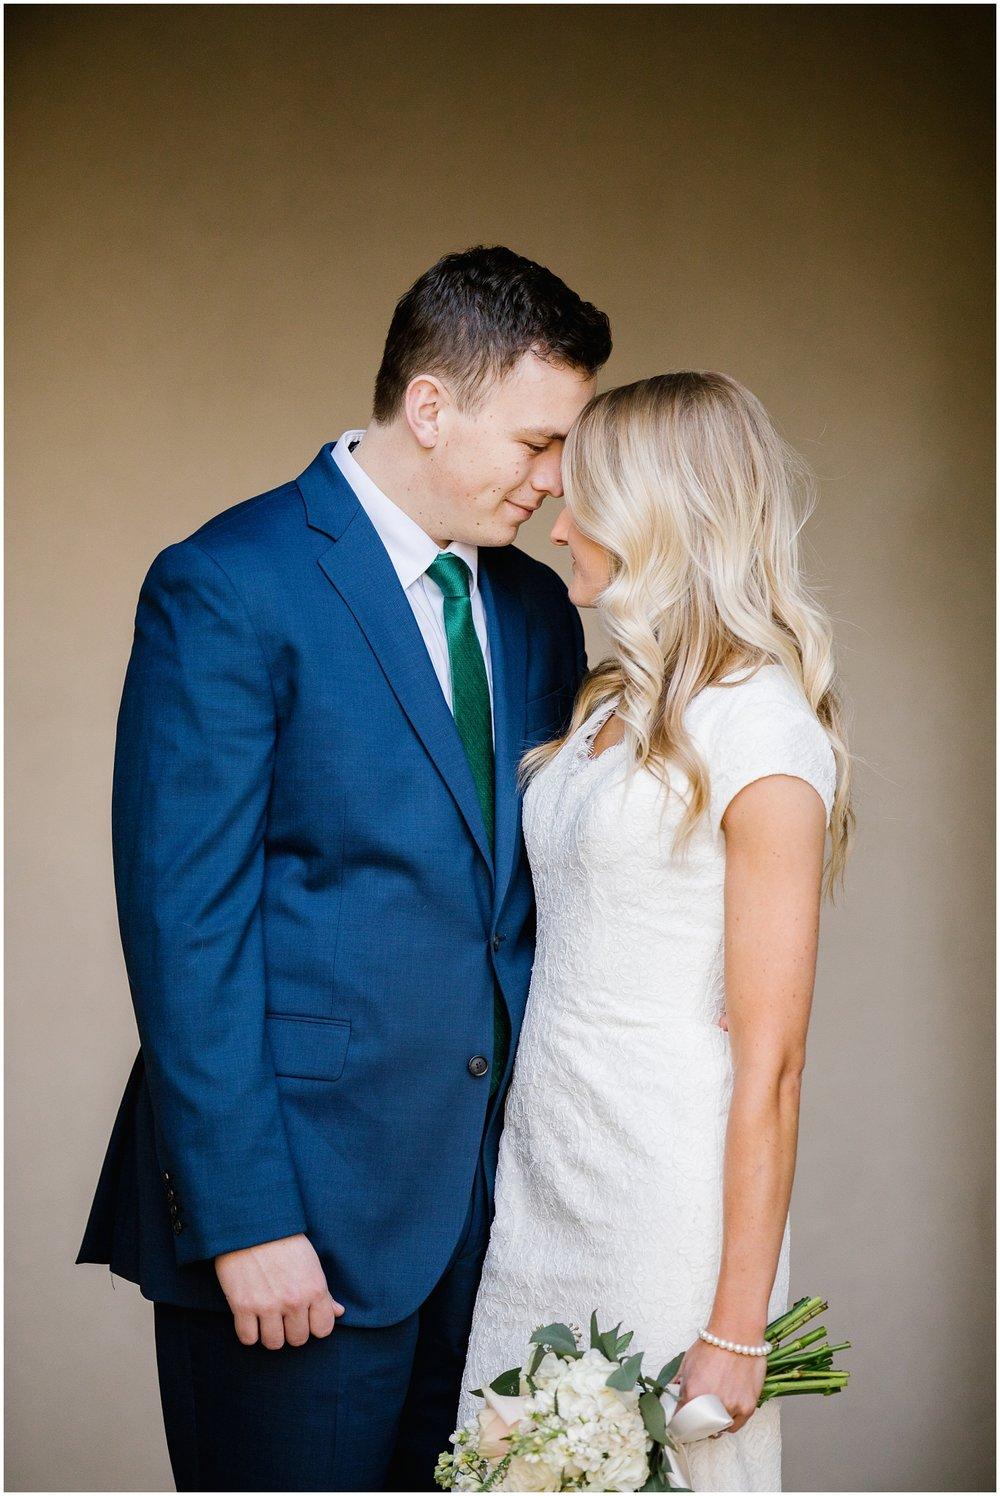 TA-Bridals-20_Lizzie-B-Imagery-Utah-Wedding-Photographer-Park-City-Salt-Lake-City-Thanksgiving-Point-Ashton-Gardens-Lehi-Utah.jpg